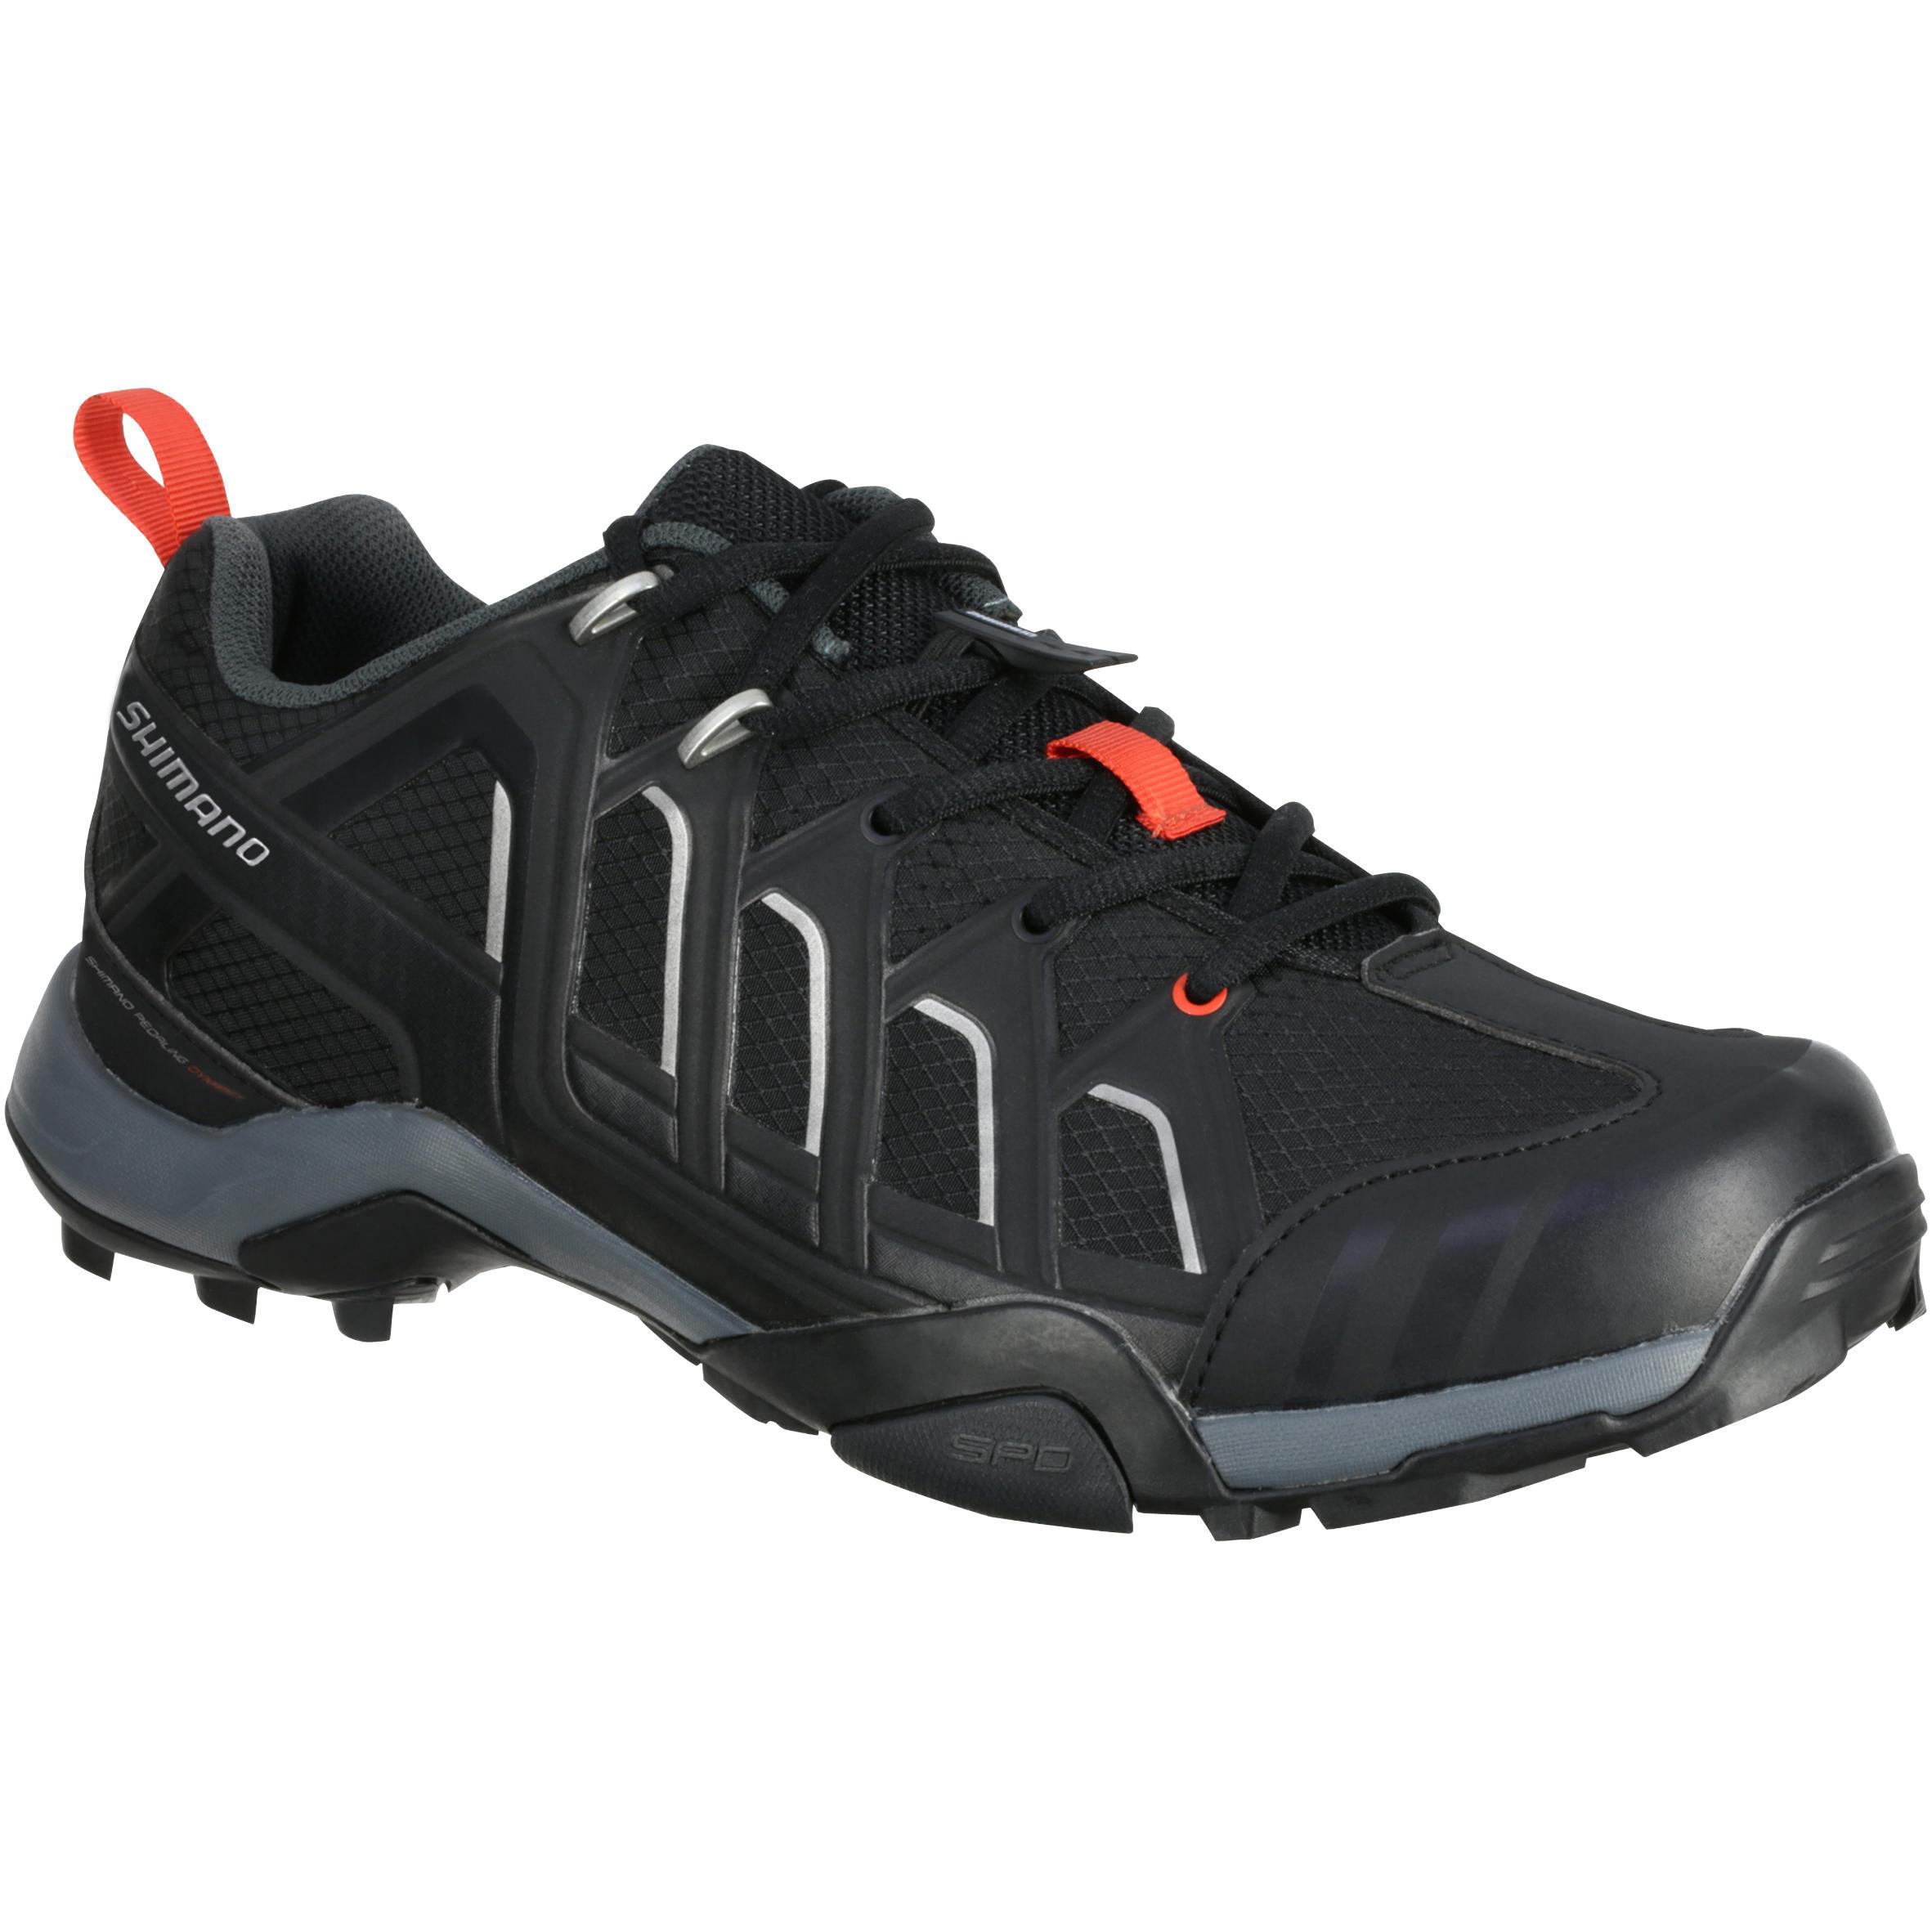 Shimano MTB-schoenen Shimano MT34 zwart kopen